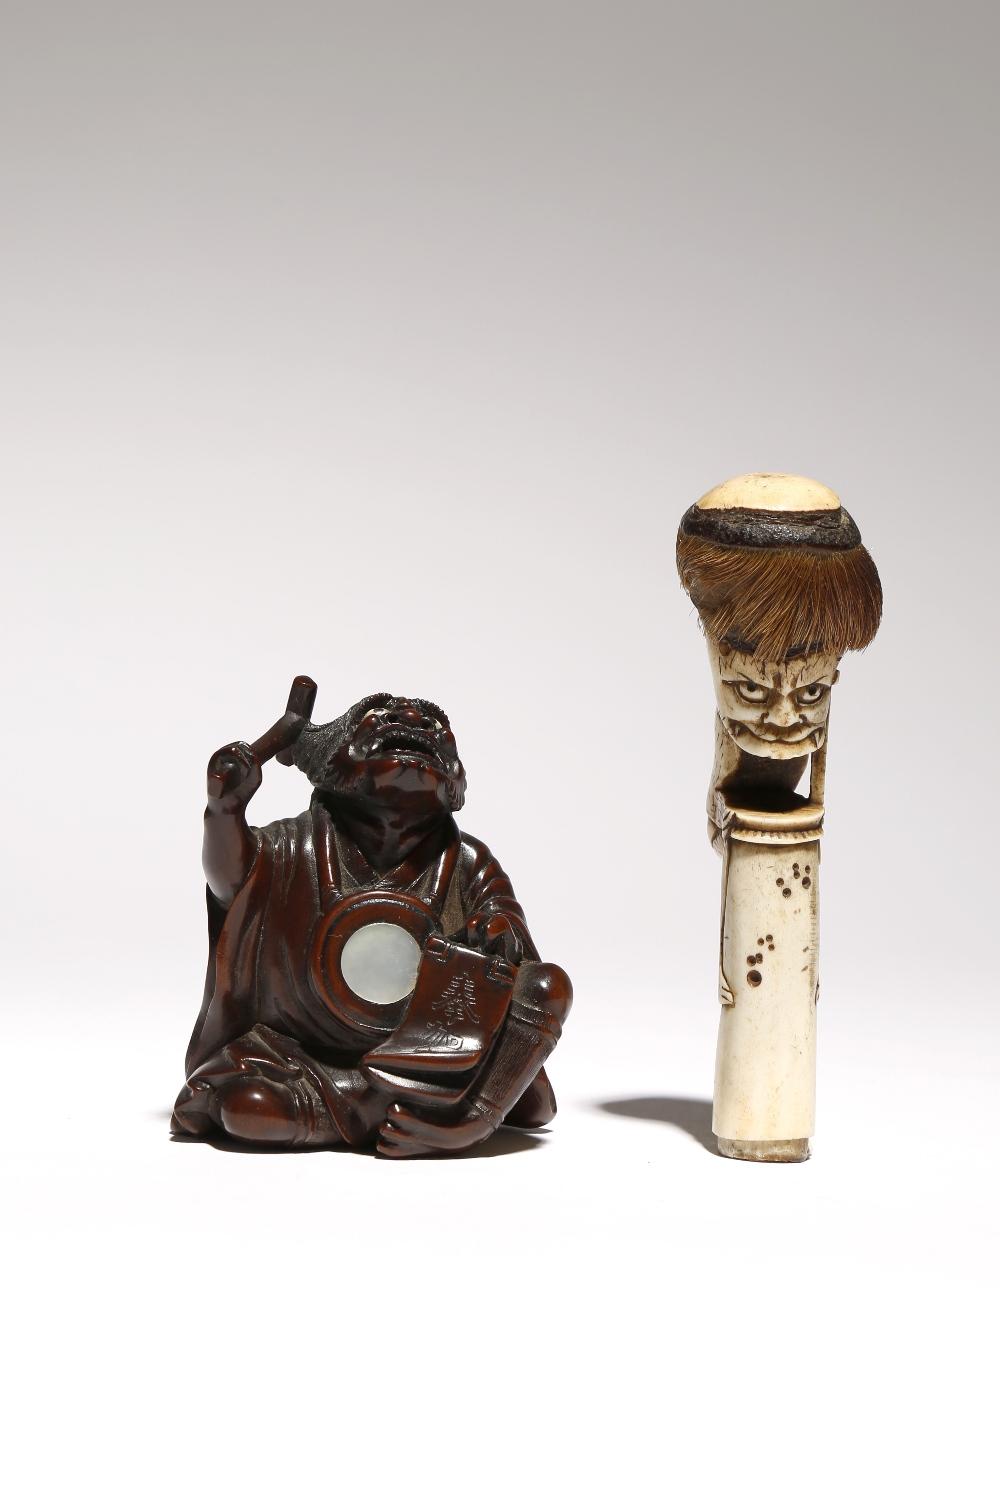 A JAPANESE WOOD OKIMONO OF AN ONI NEMBUTSU MEIJI PERIOD, 19TH CENTURY The repentant demon wearing